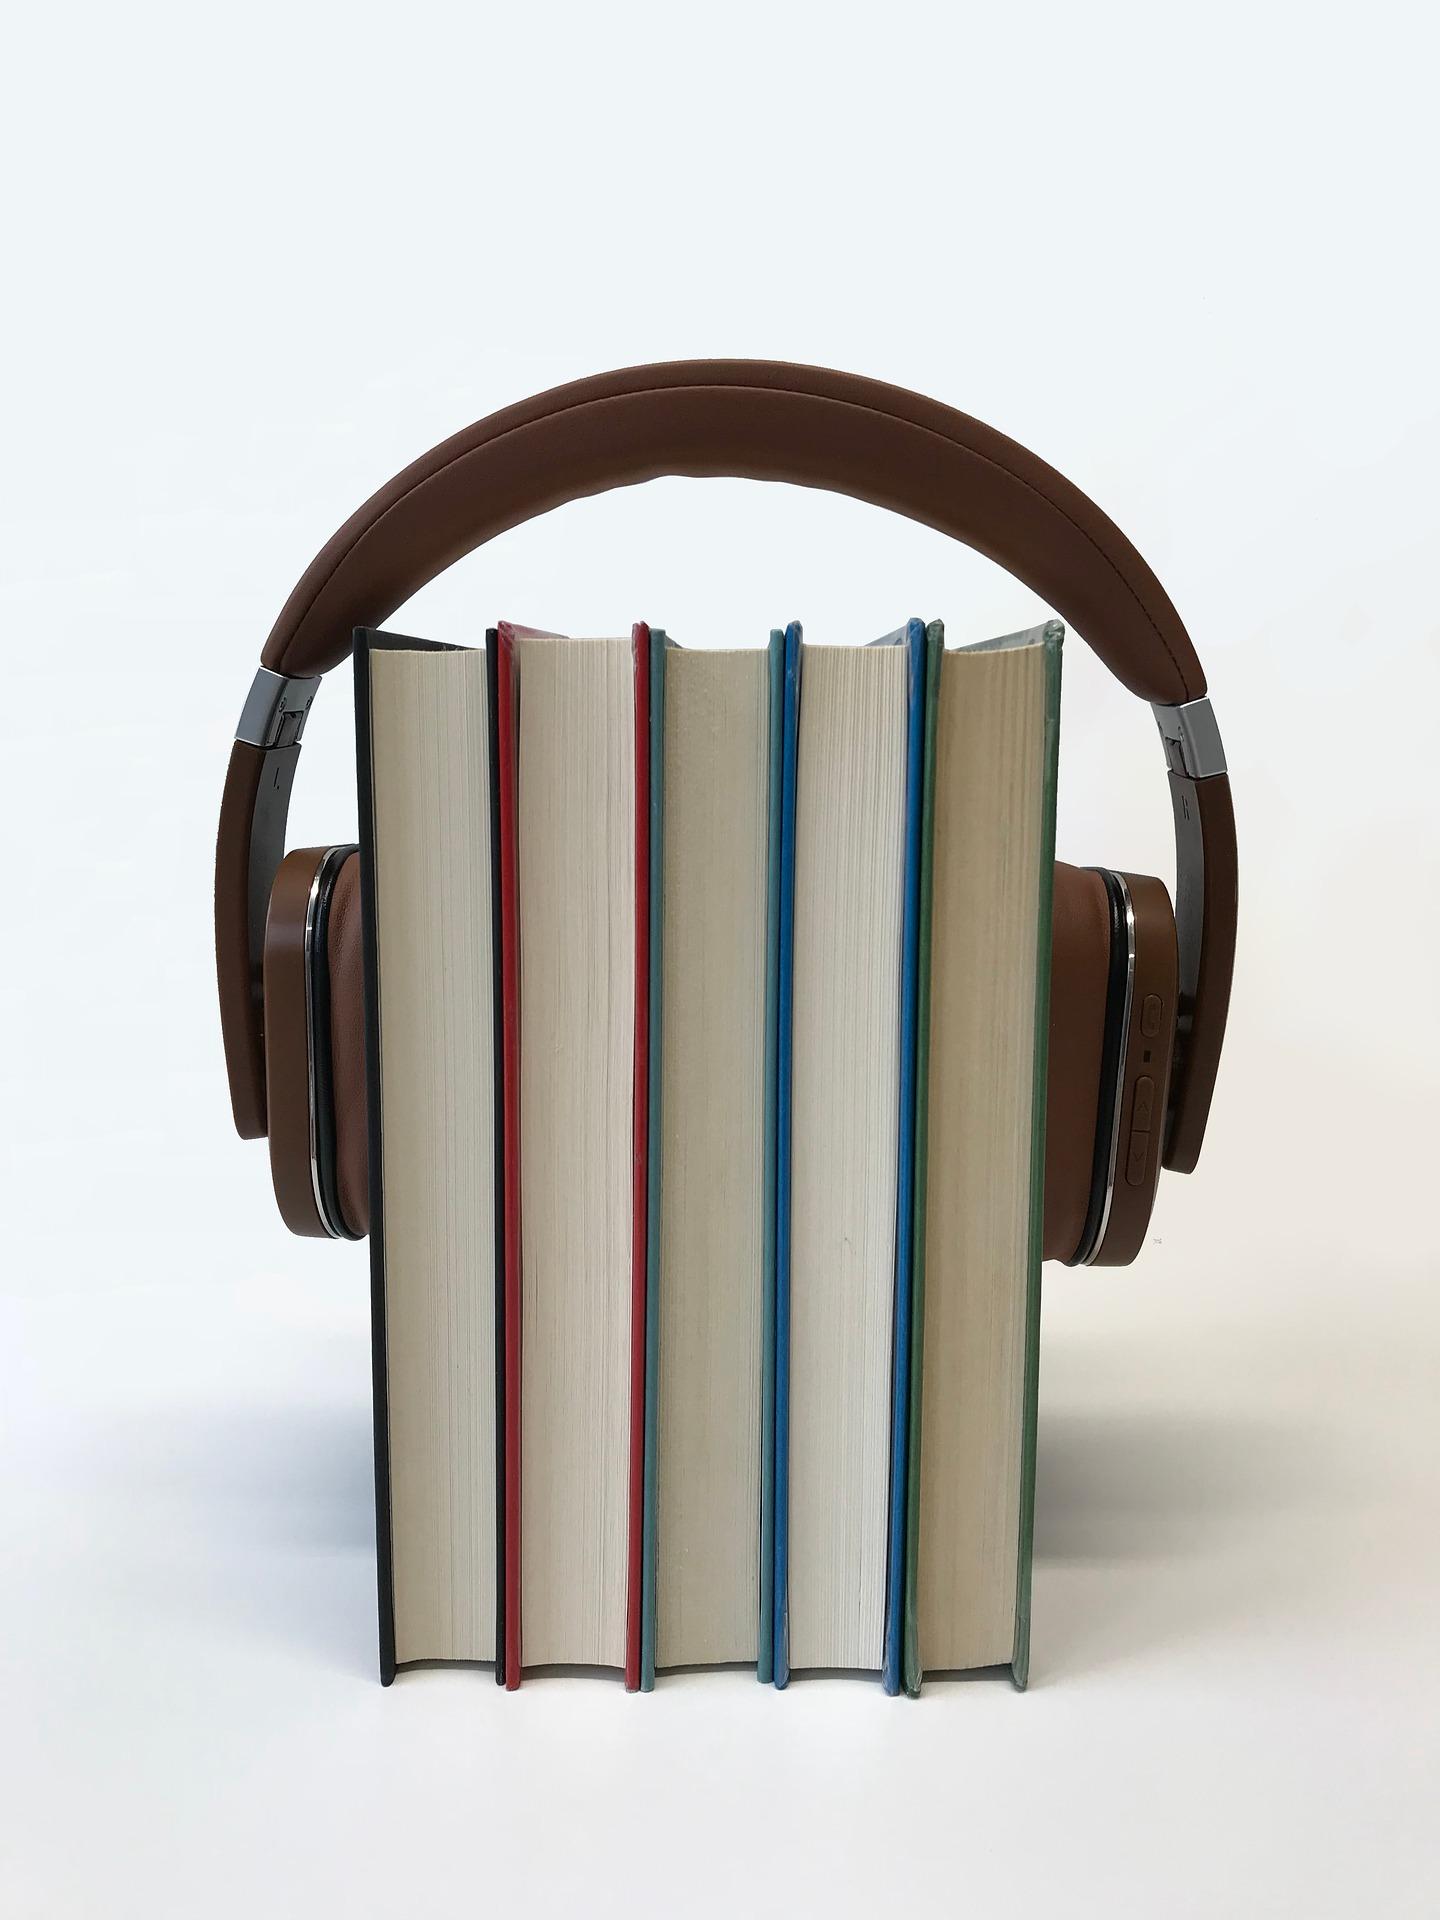 headphones-3658441_1920